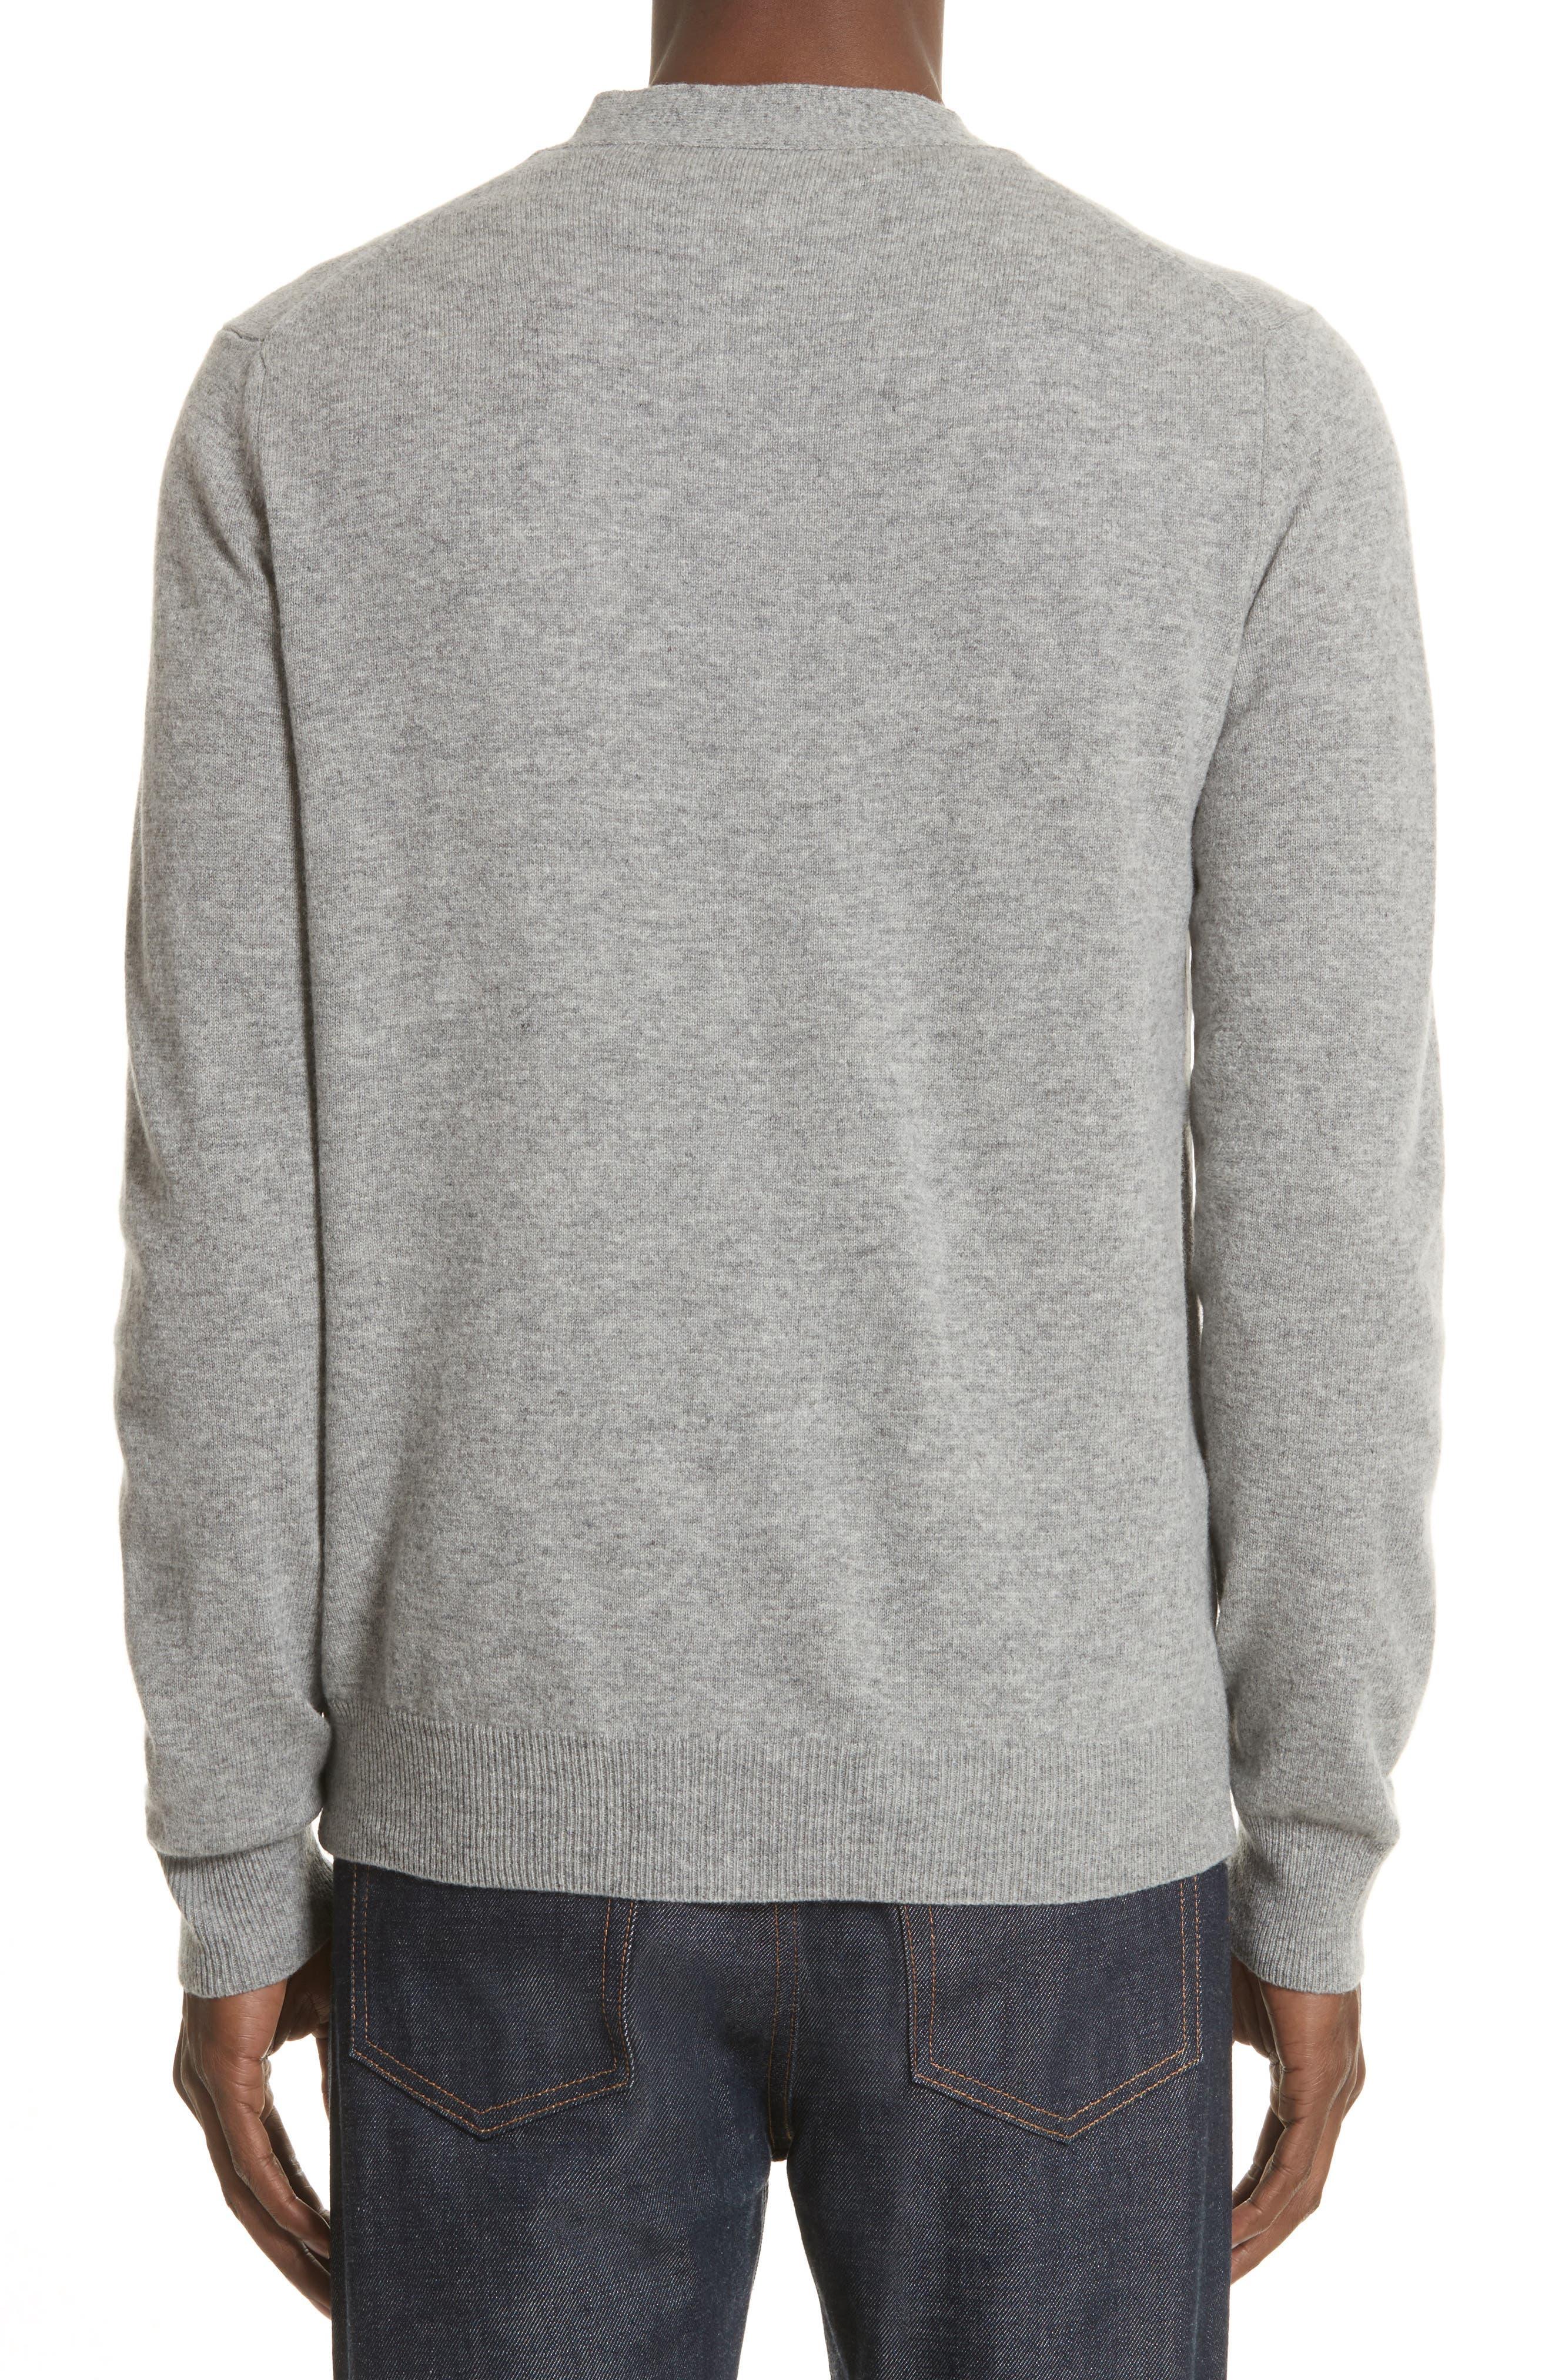 White Heart Wool Cardigan,                             Alternate thumbnail 2, color,                             Light Grey